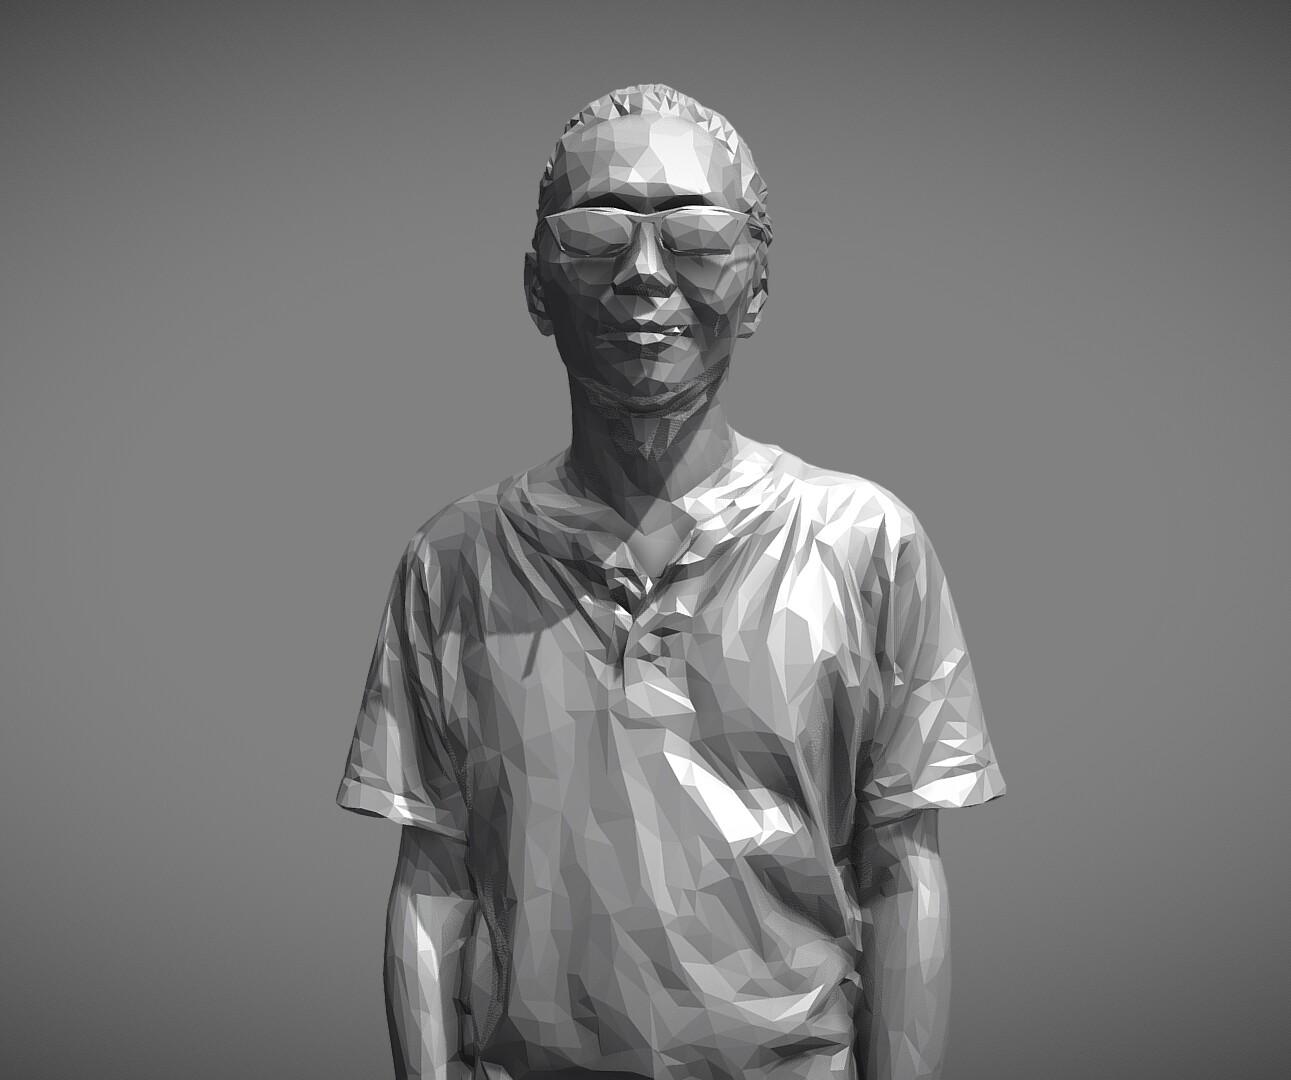 Michael wu 3d models by mwopus mwopus sketchfab20190320 007960